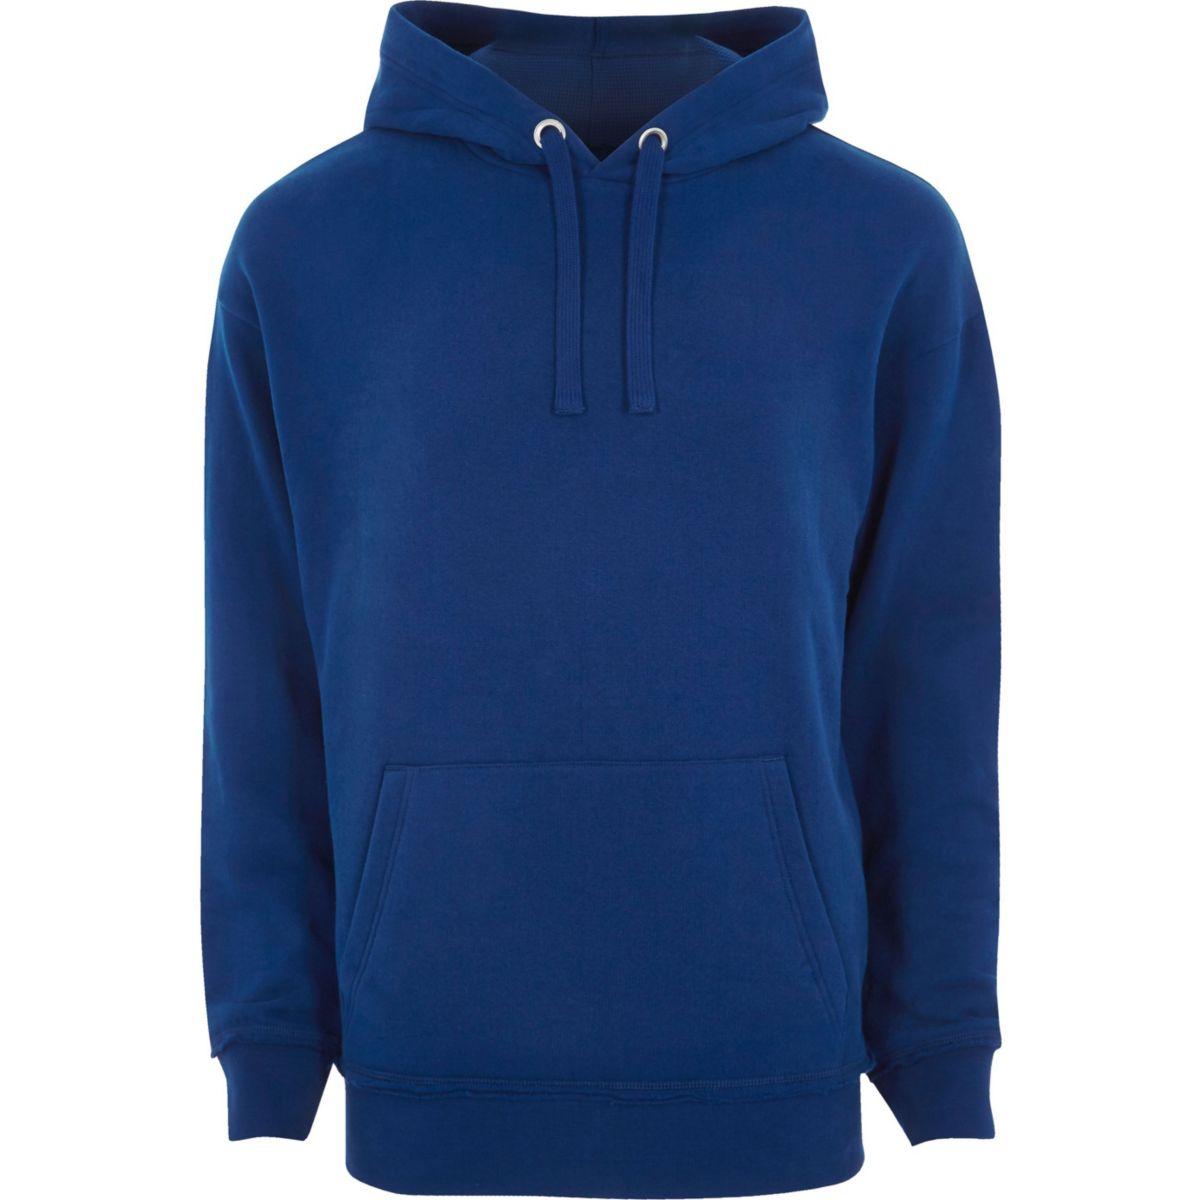 Big and Tall blue long sleeve hoodie